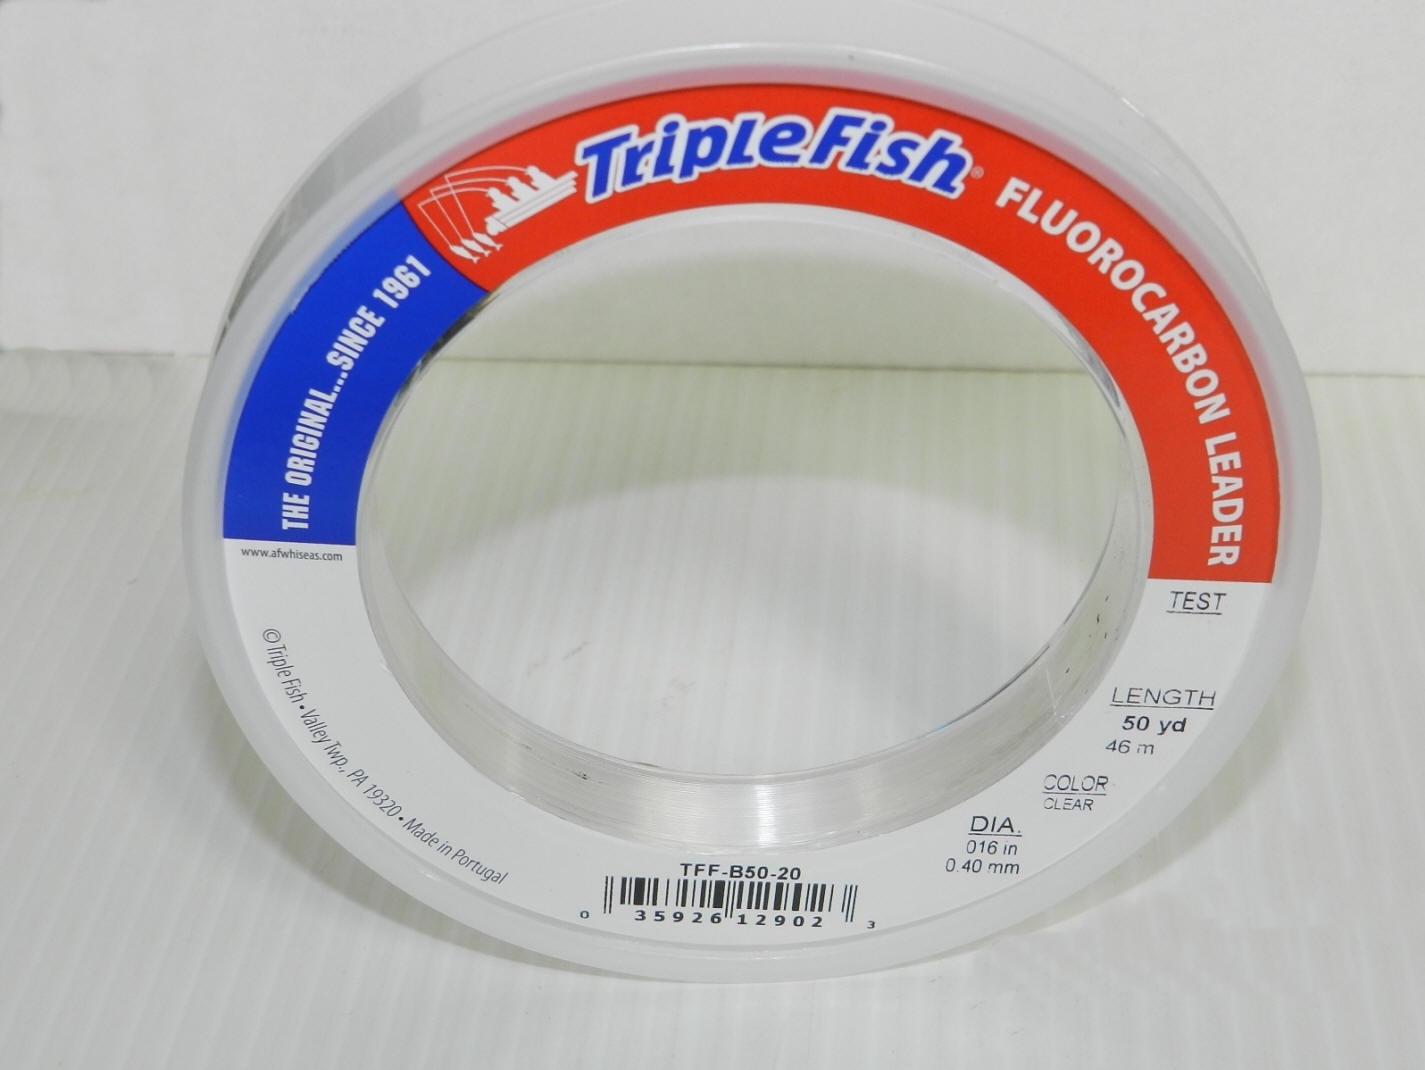 25 yd Bracelet Triple Fish Fluorocarbon Leader Material